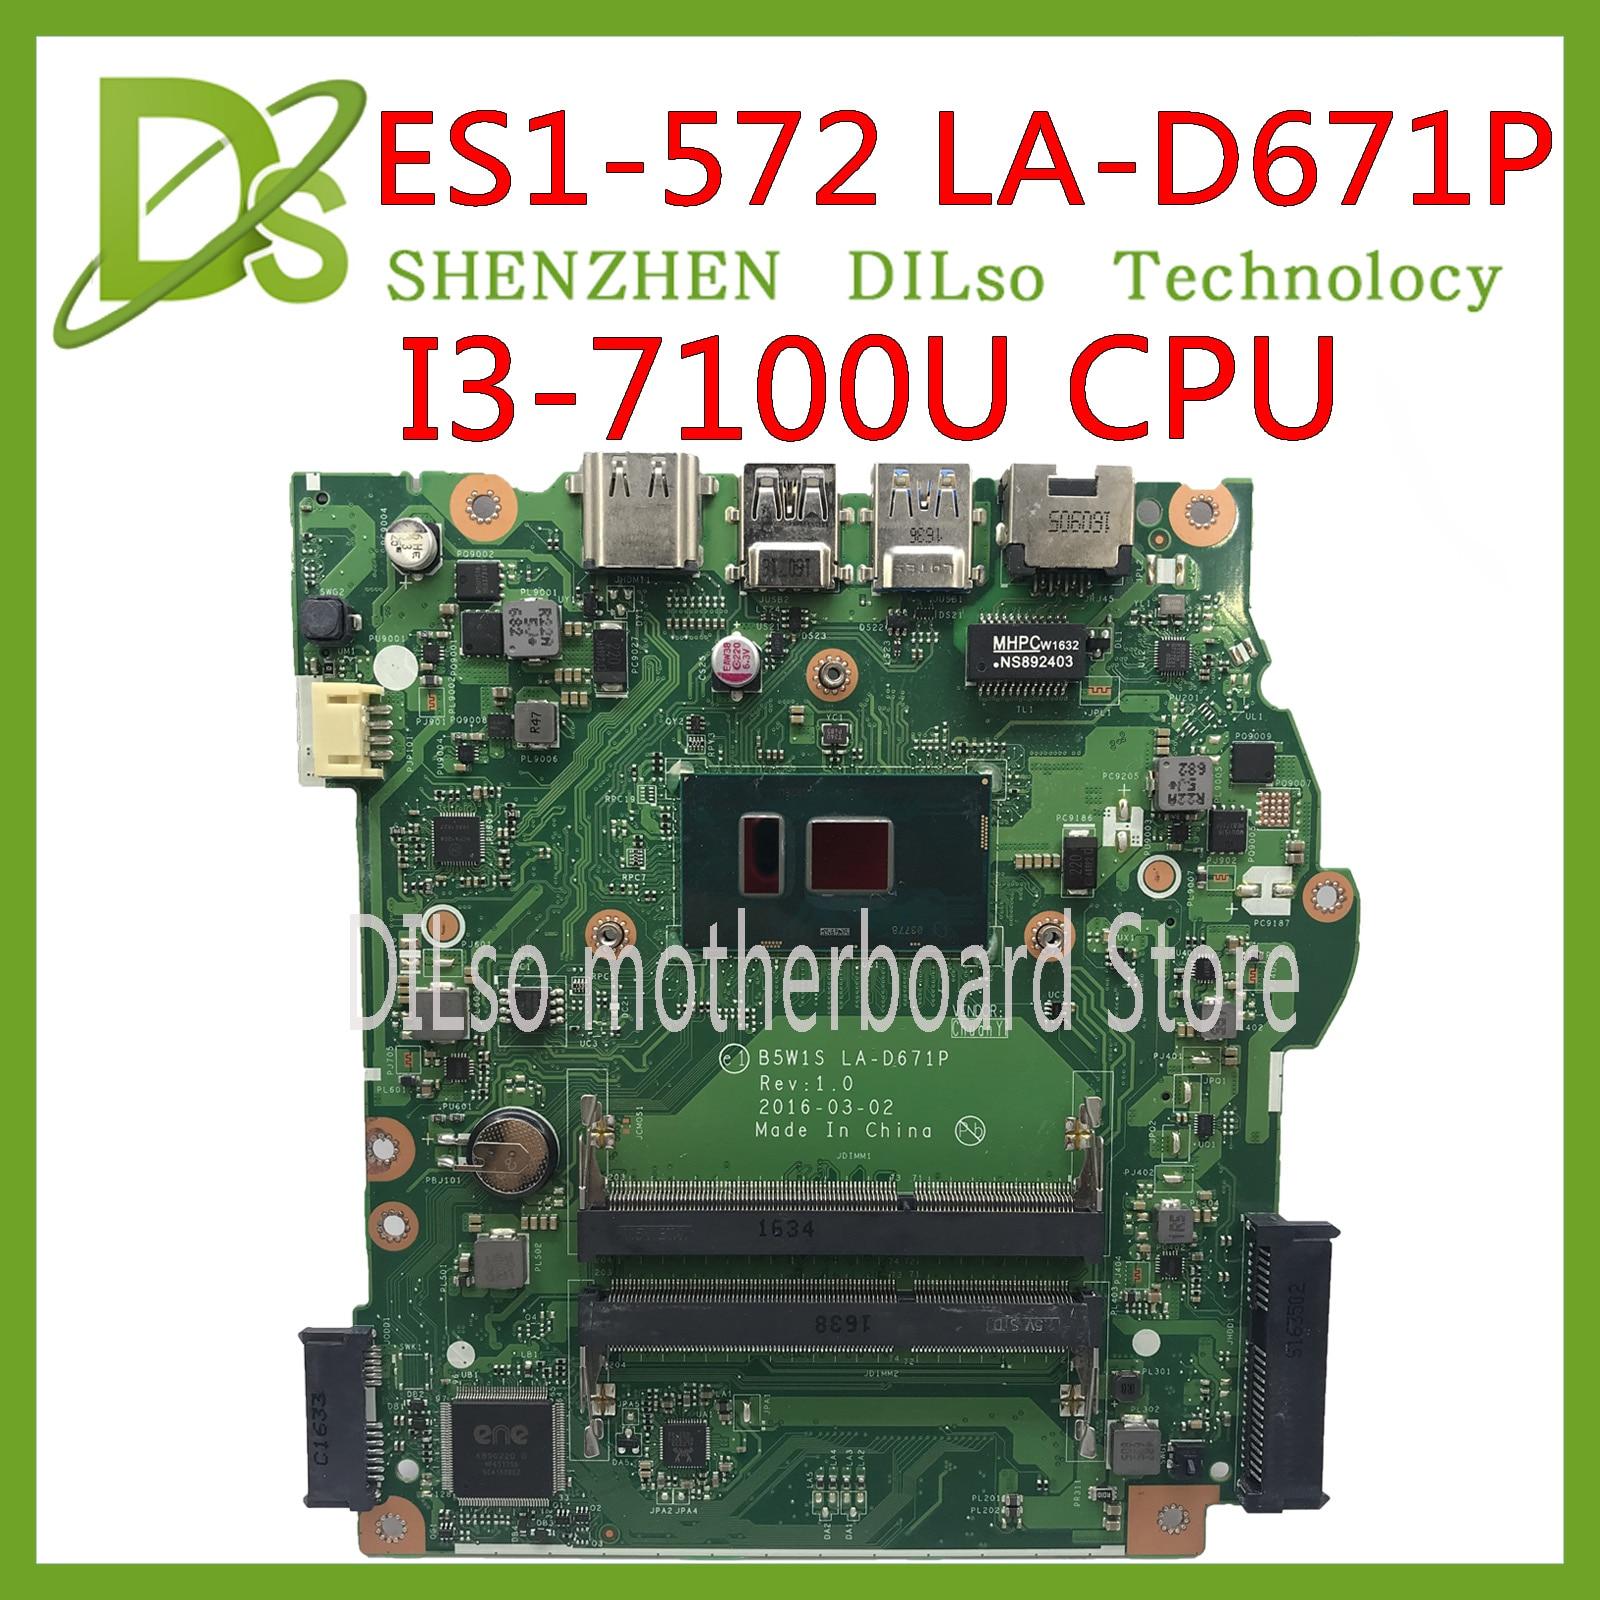 KEFU LA-D671P Mainboard For Acer Aspire ES1-572 Laptop Motherboard I3-7100u B5W1S LA-D671P Work 100% Original